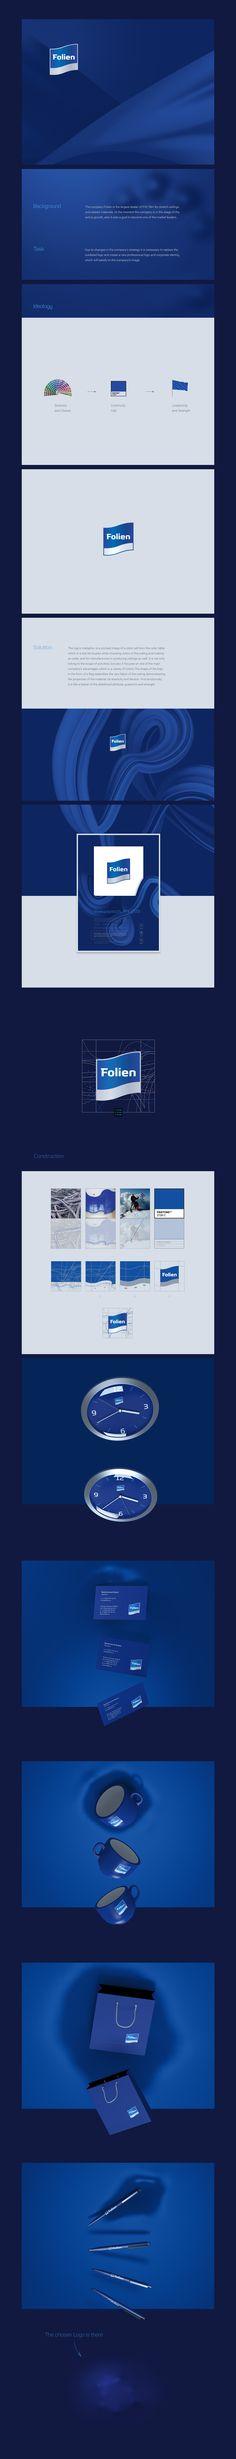 Folien by Denis Ulyanov, via Behance #logodesign #logo #logotype #design #branding #logoped #Russia